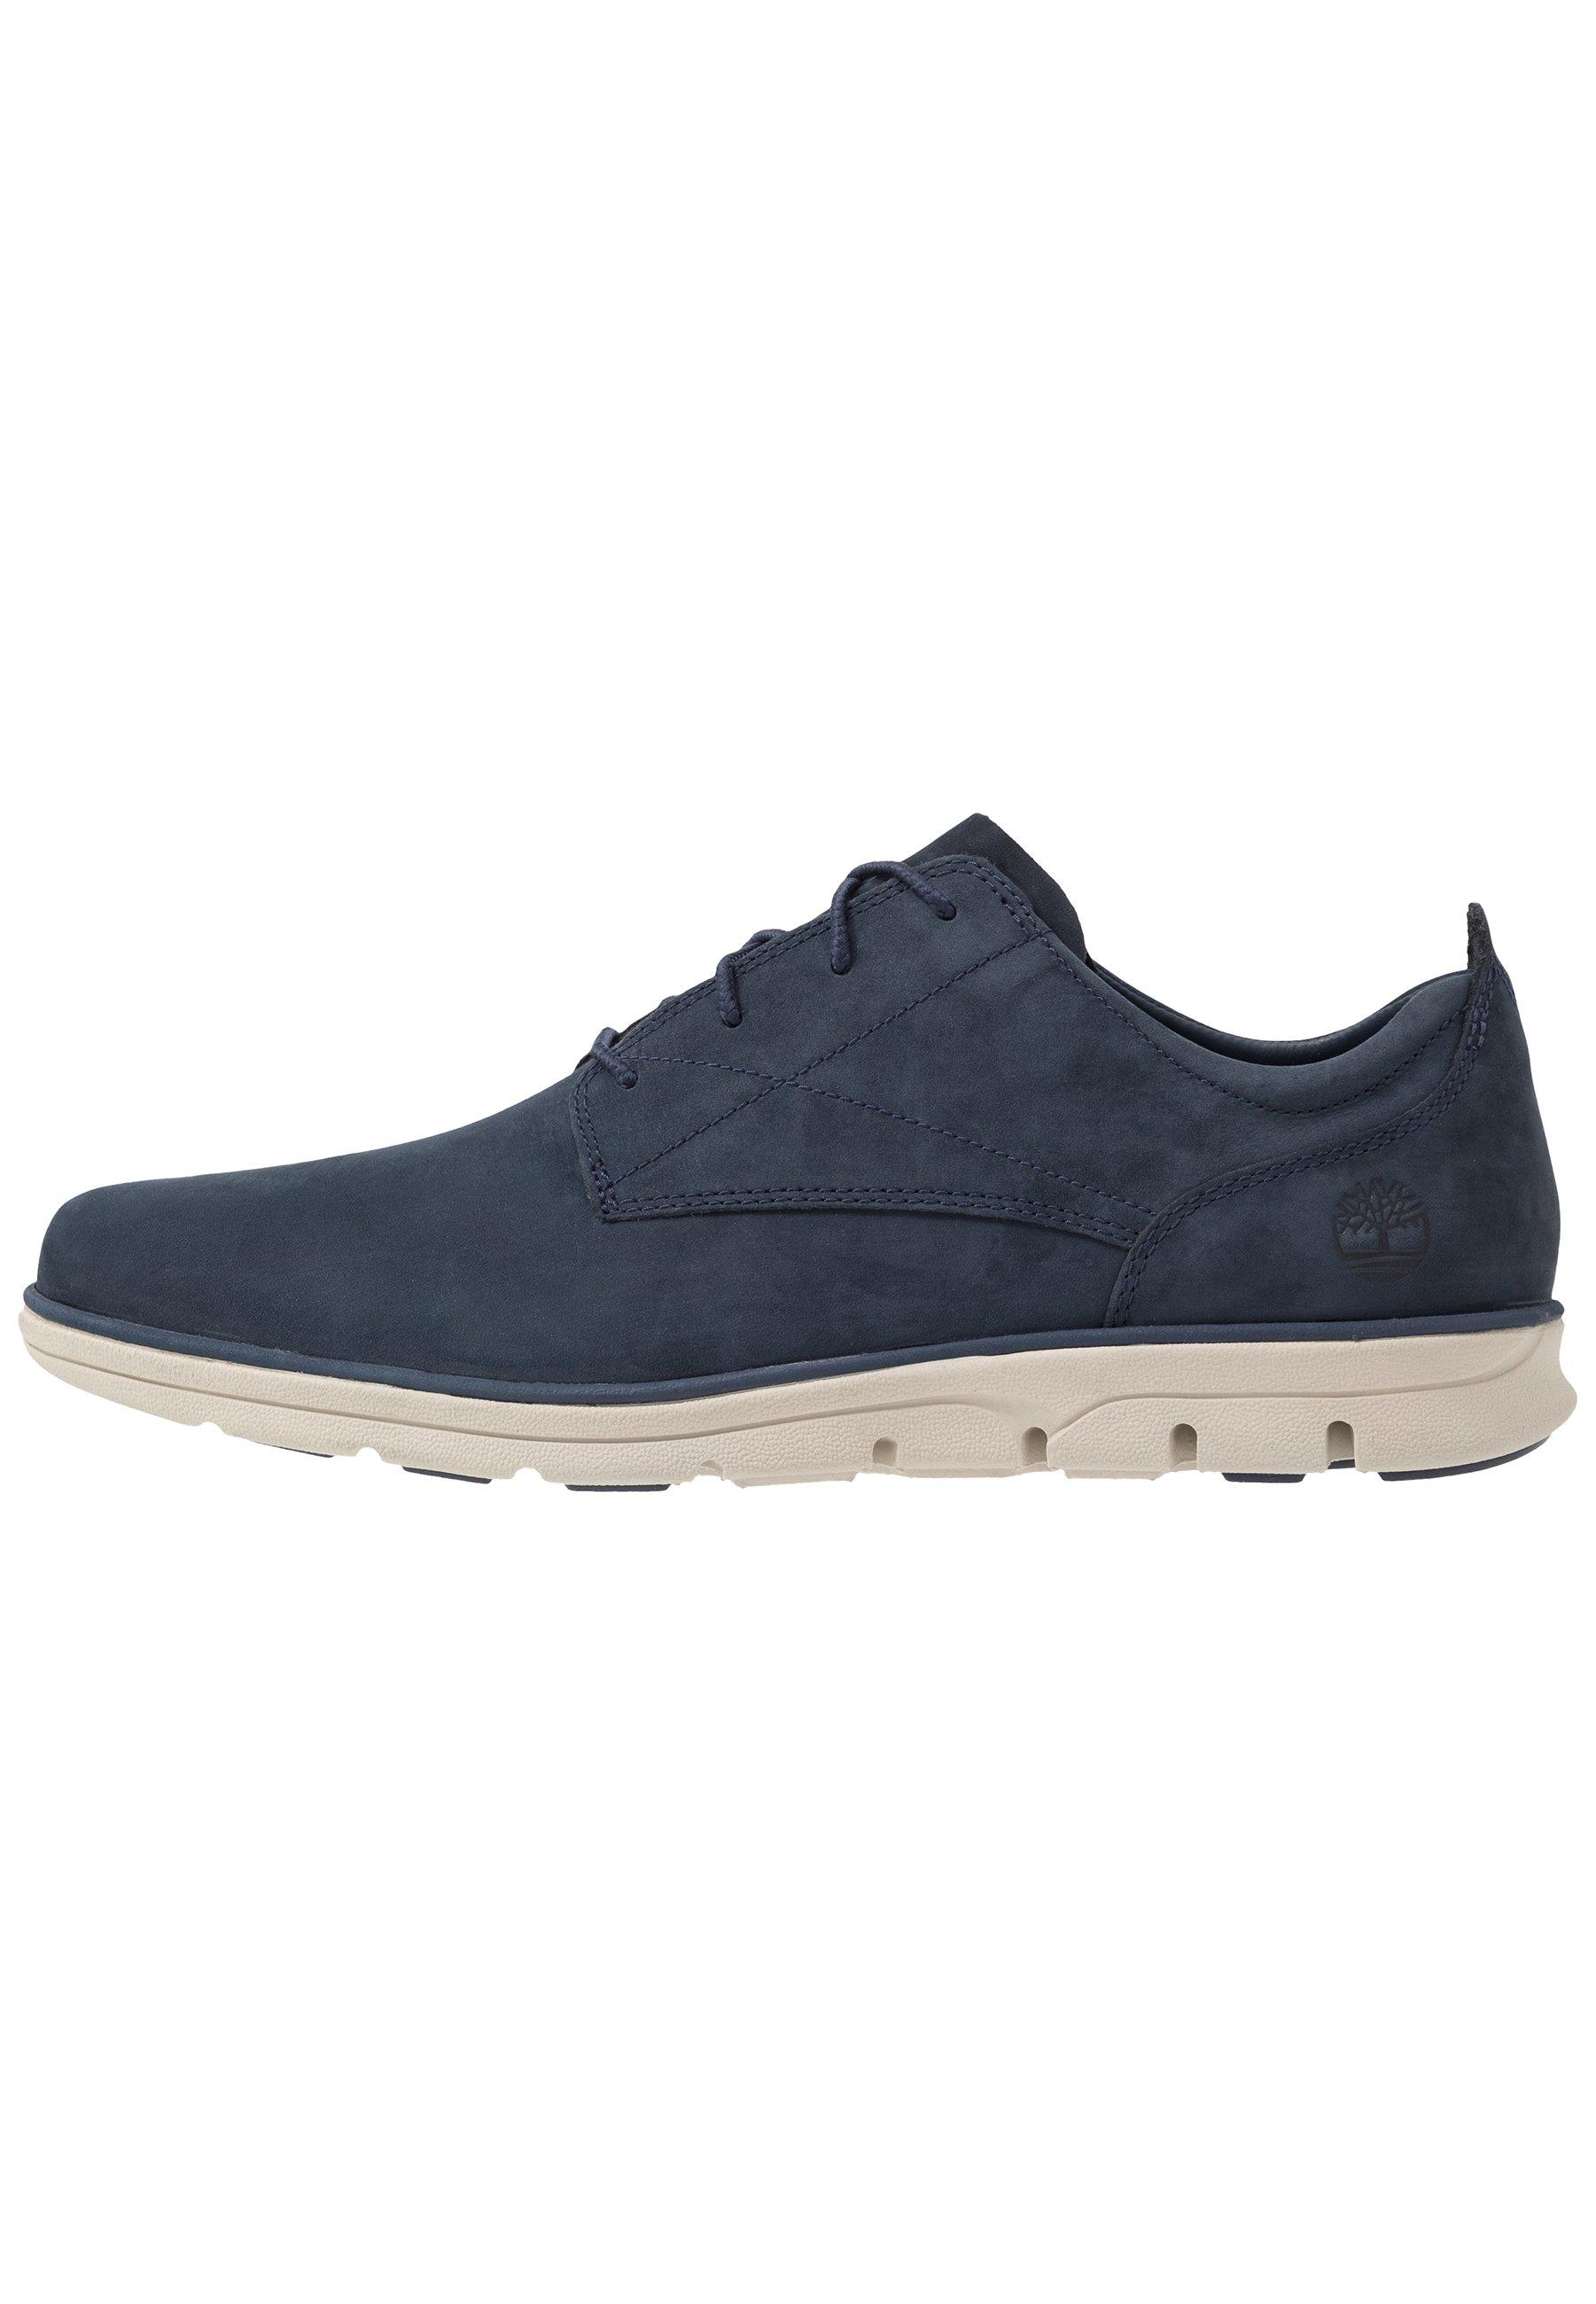 Homme BRADSTREET - Chaussures à lacets